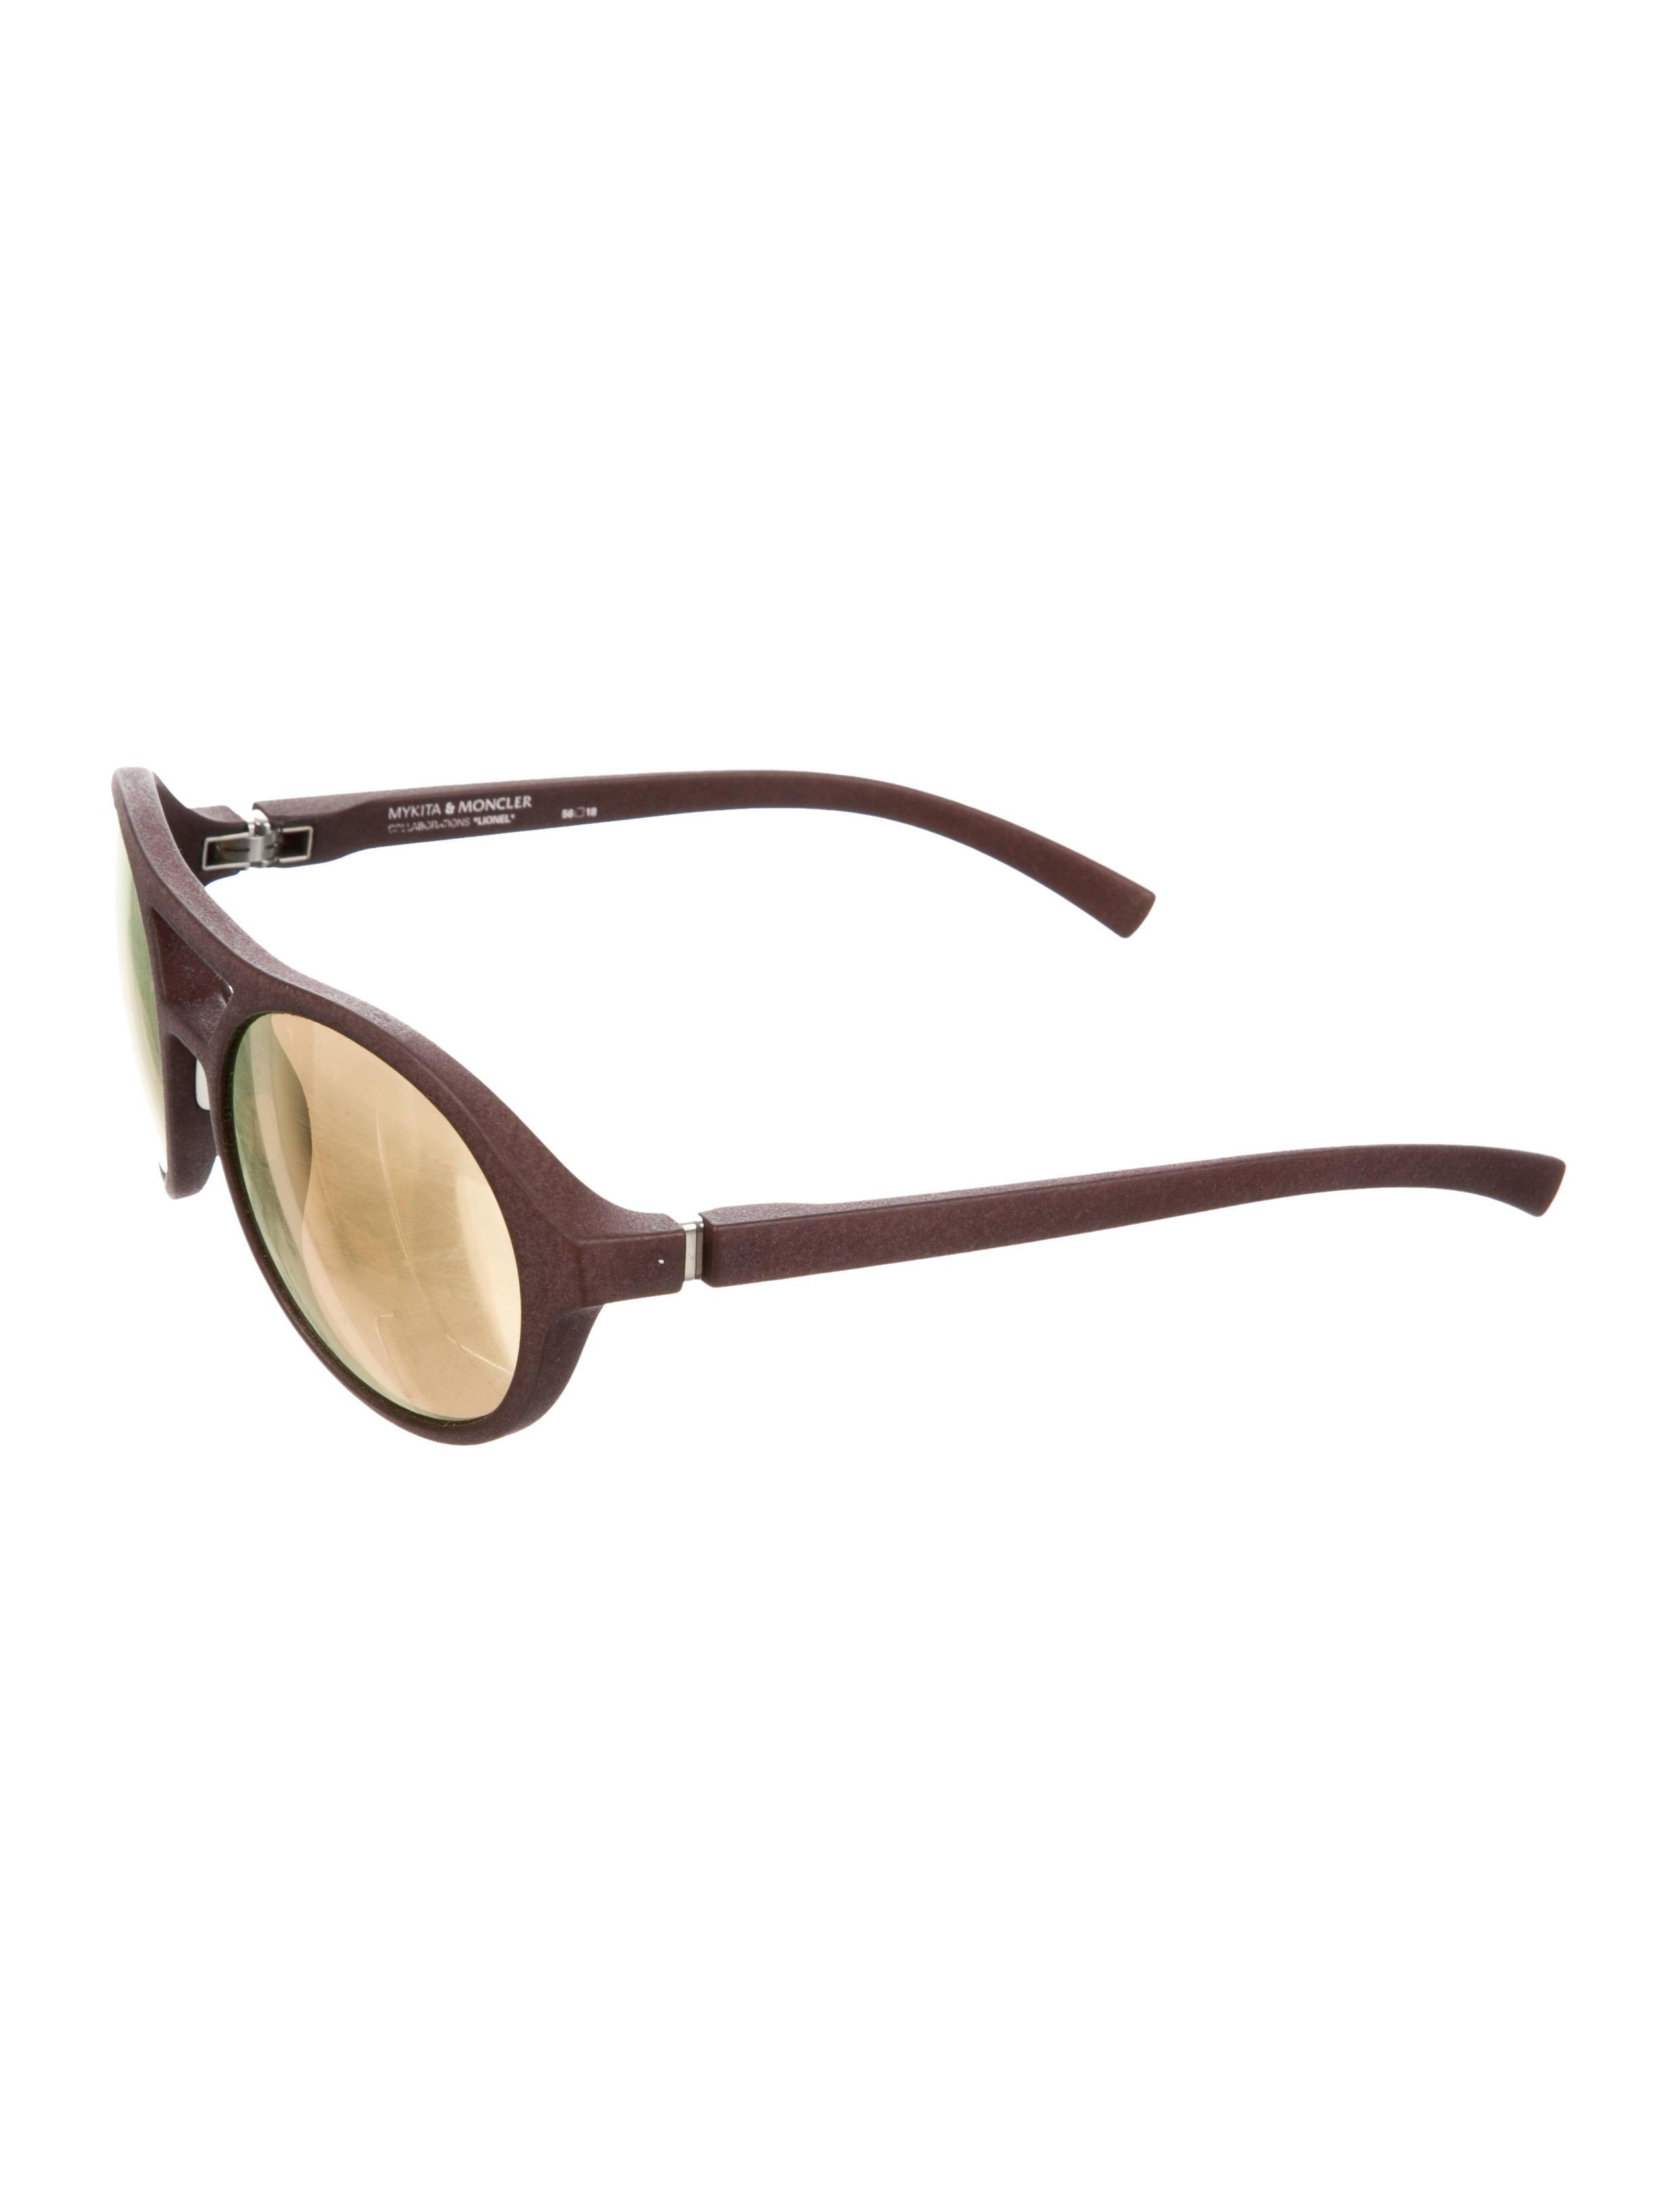 c6249be391c Mykita x Moncler Round Mirrored Sunglasses - Accessories - MYXMC20003